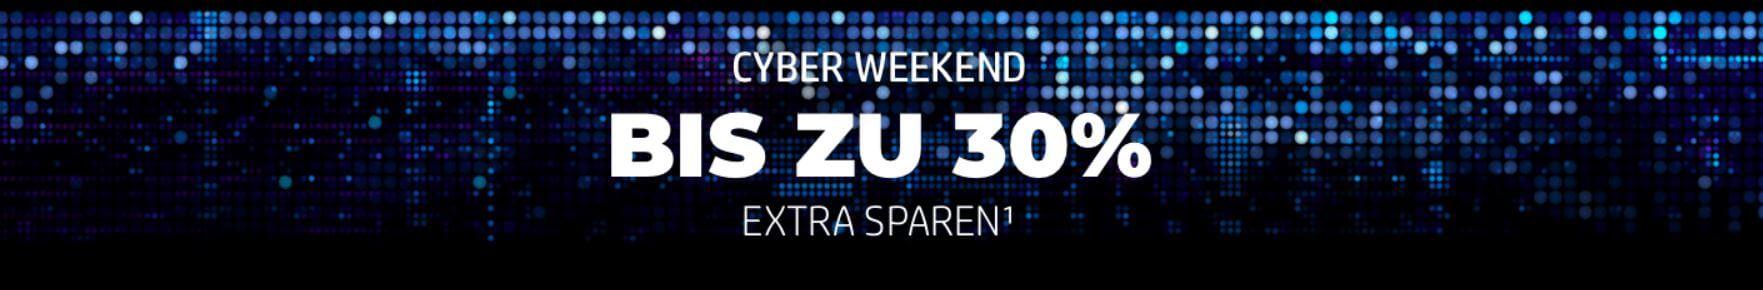 HP Cyber Weekend Banner